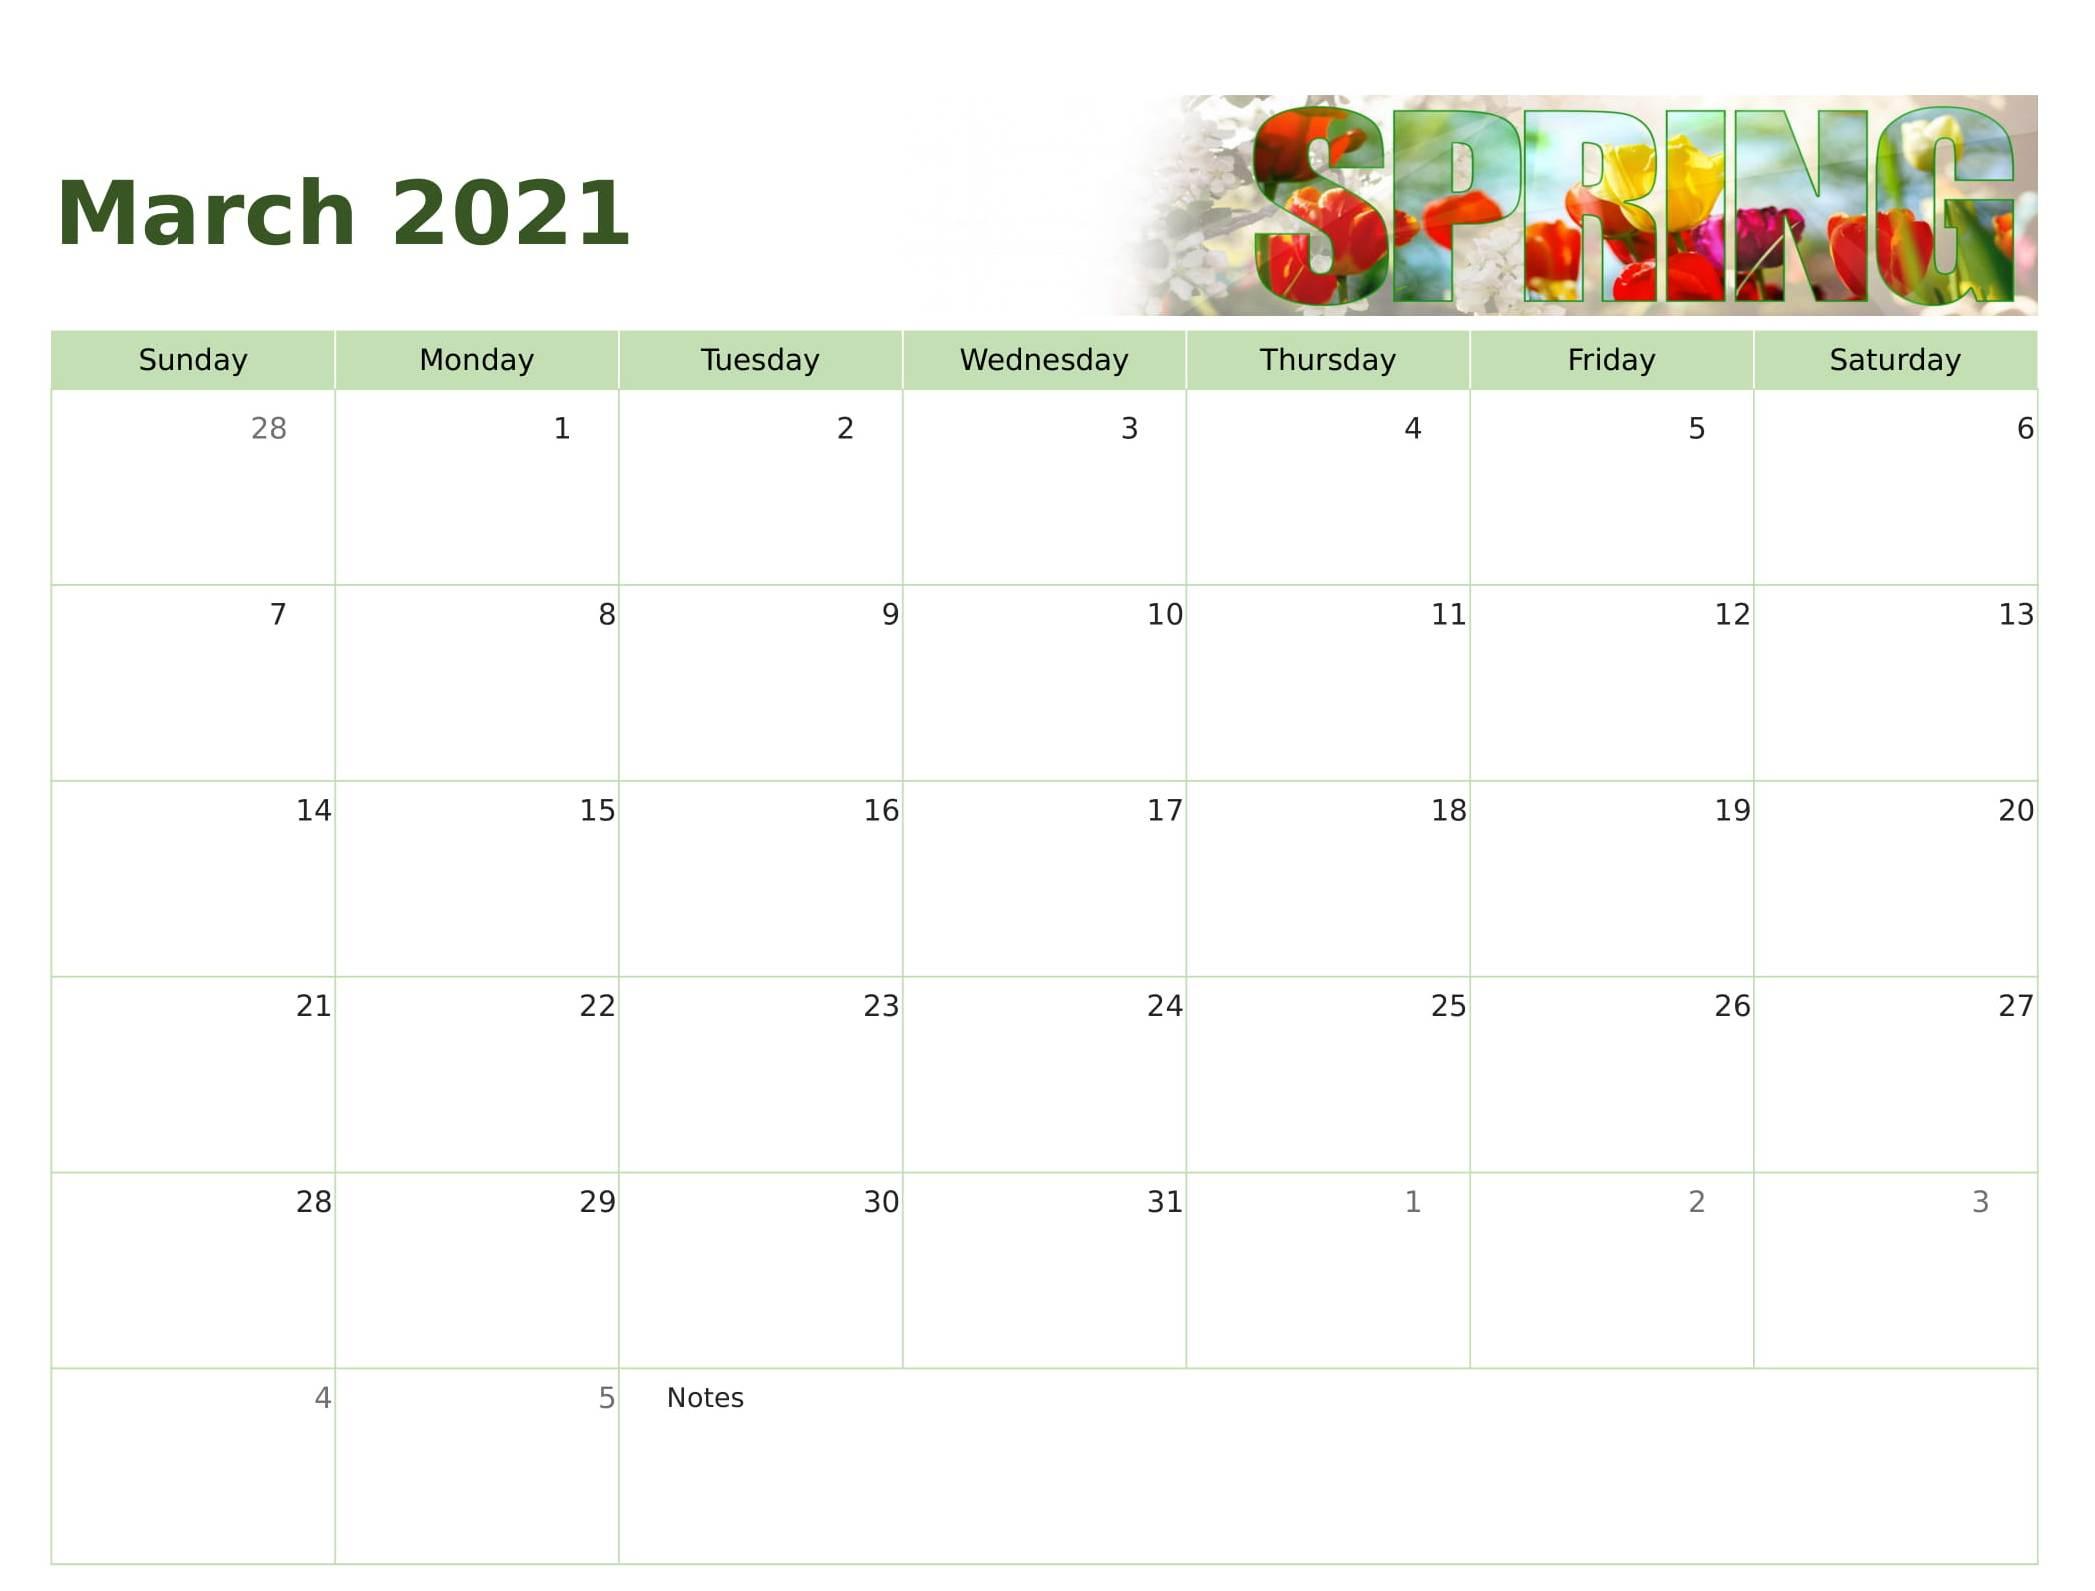 Cute March 2021 Calendar Printable Design - Printable Within March 2021 Calendar Template